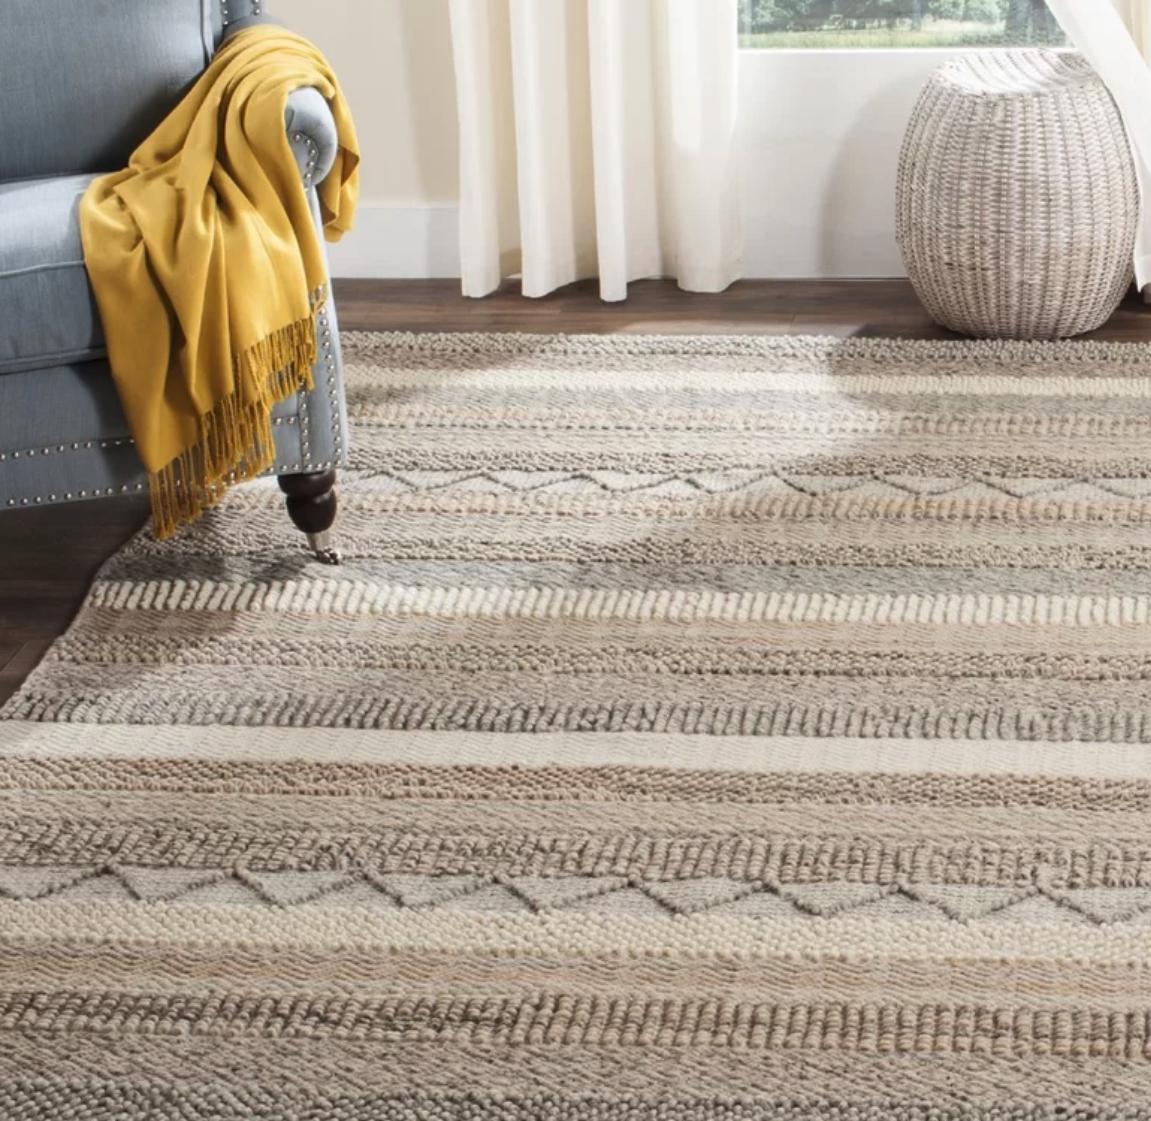 7 Beautiful Beige Rugs For Classy Homes Cute Furniture